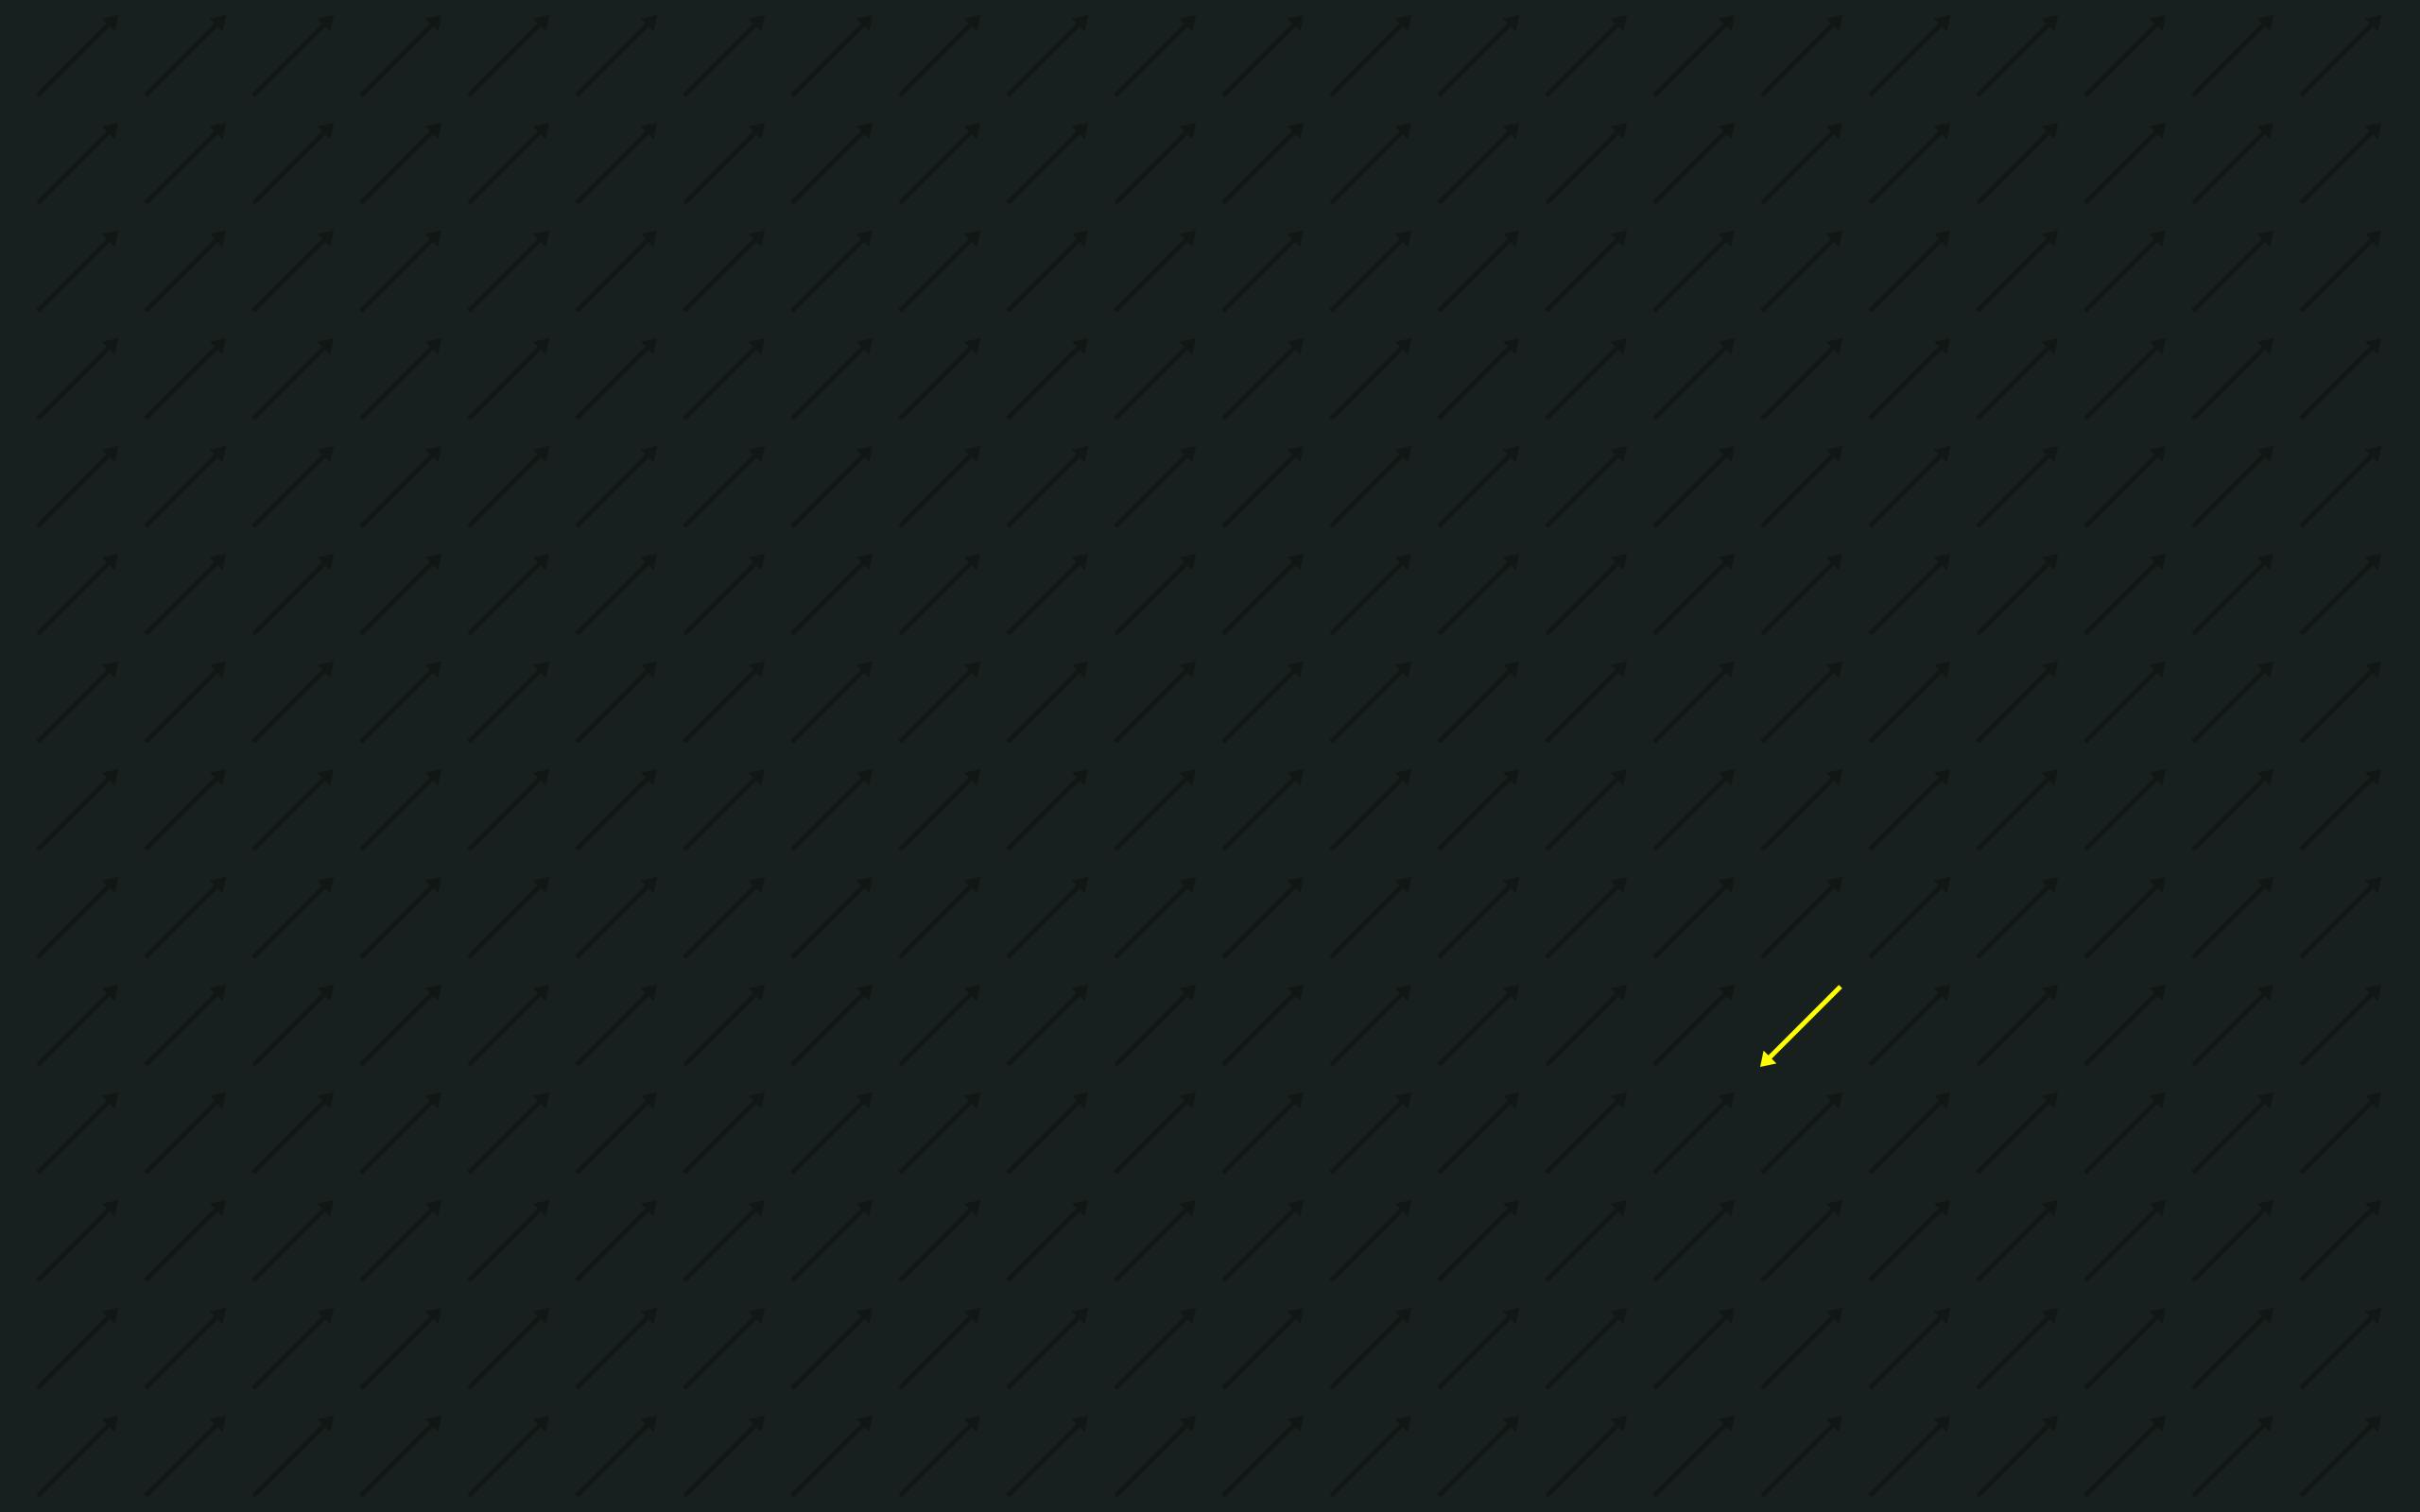 Basic Desktop Wallpapers   Top Basic Desktop Backgrounds 2560x1600